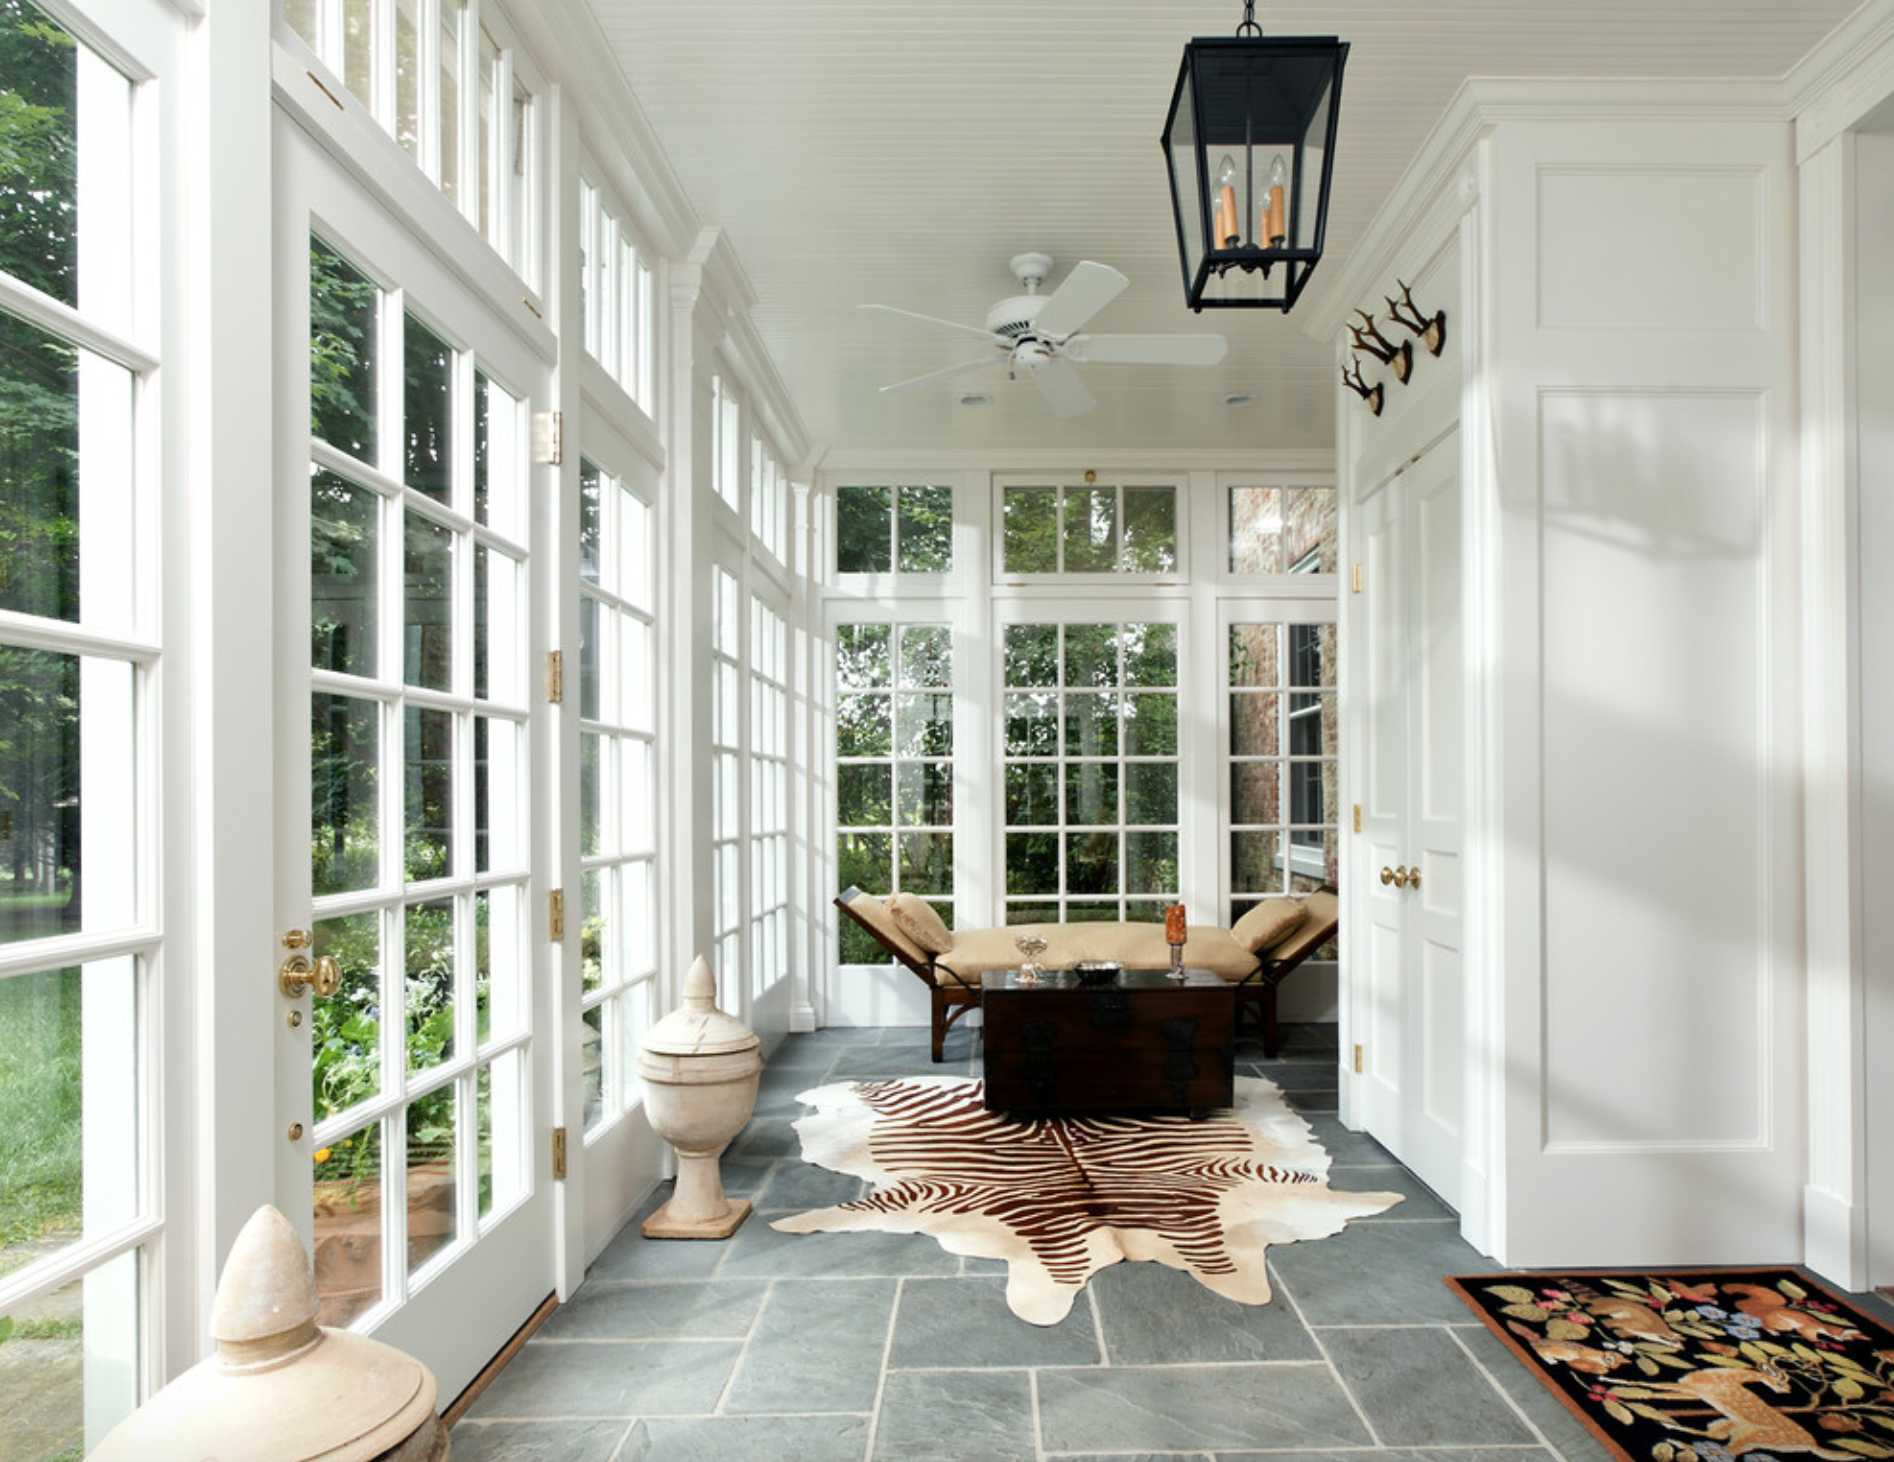 Window ideas for a sunroom  bluestone tile glass windows hall  foyer addition  pinterest